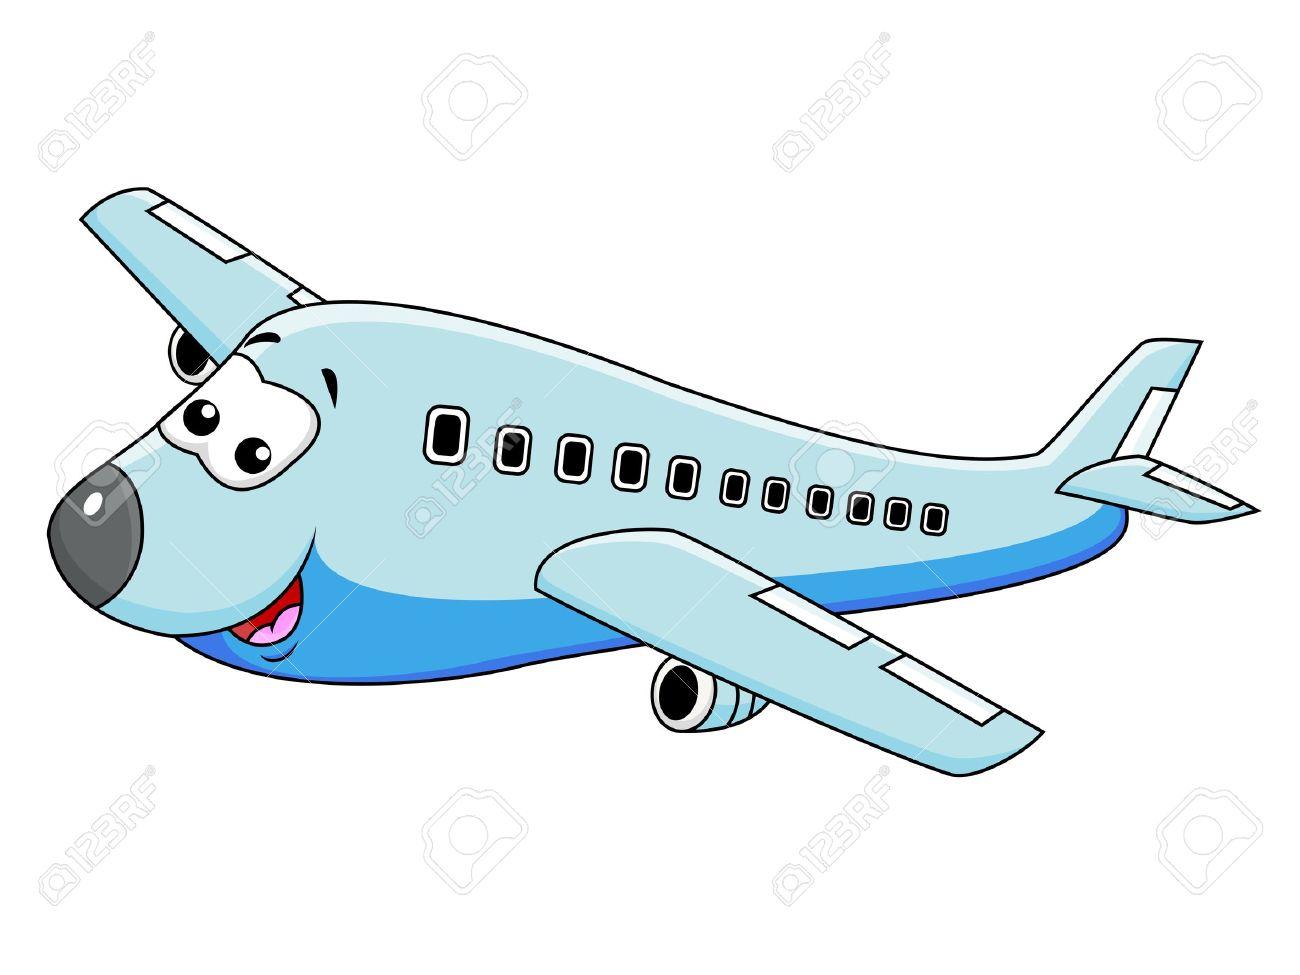 Cartoon plane free download best on